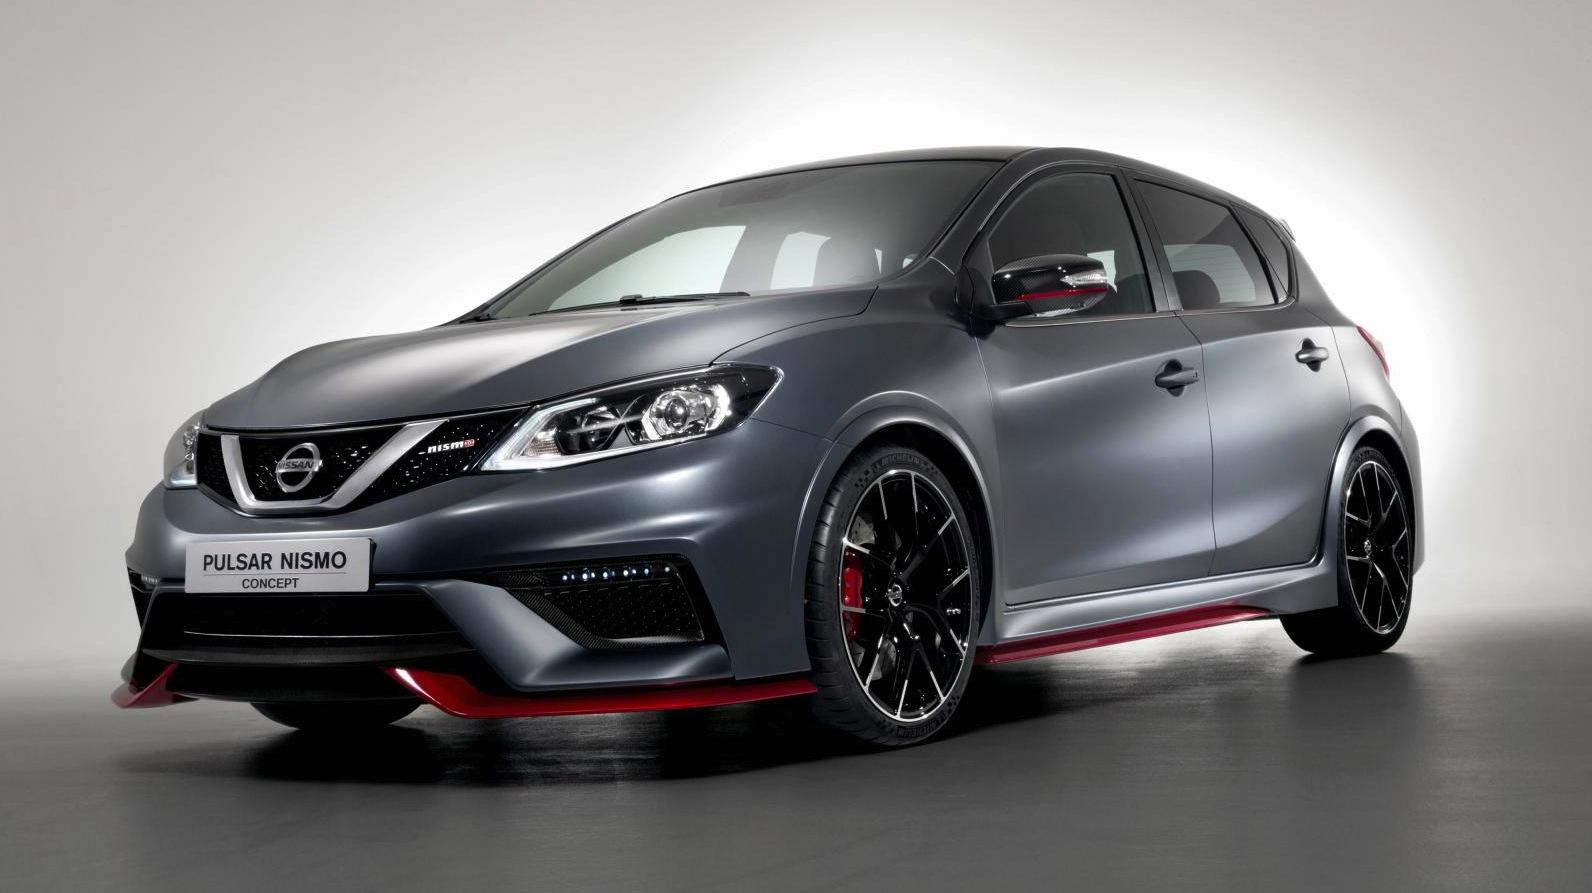 Nissan Pulsar Nismo concept revealed at Paris Motor Show